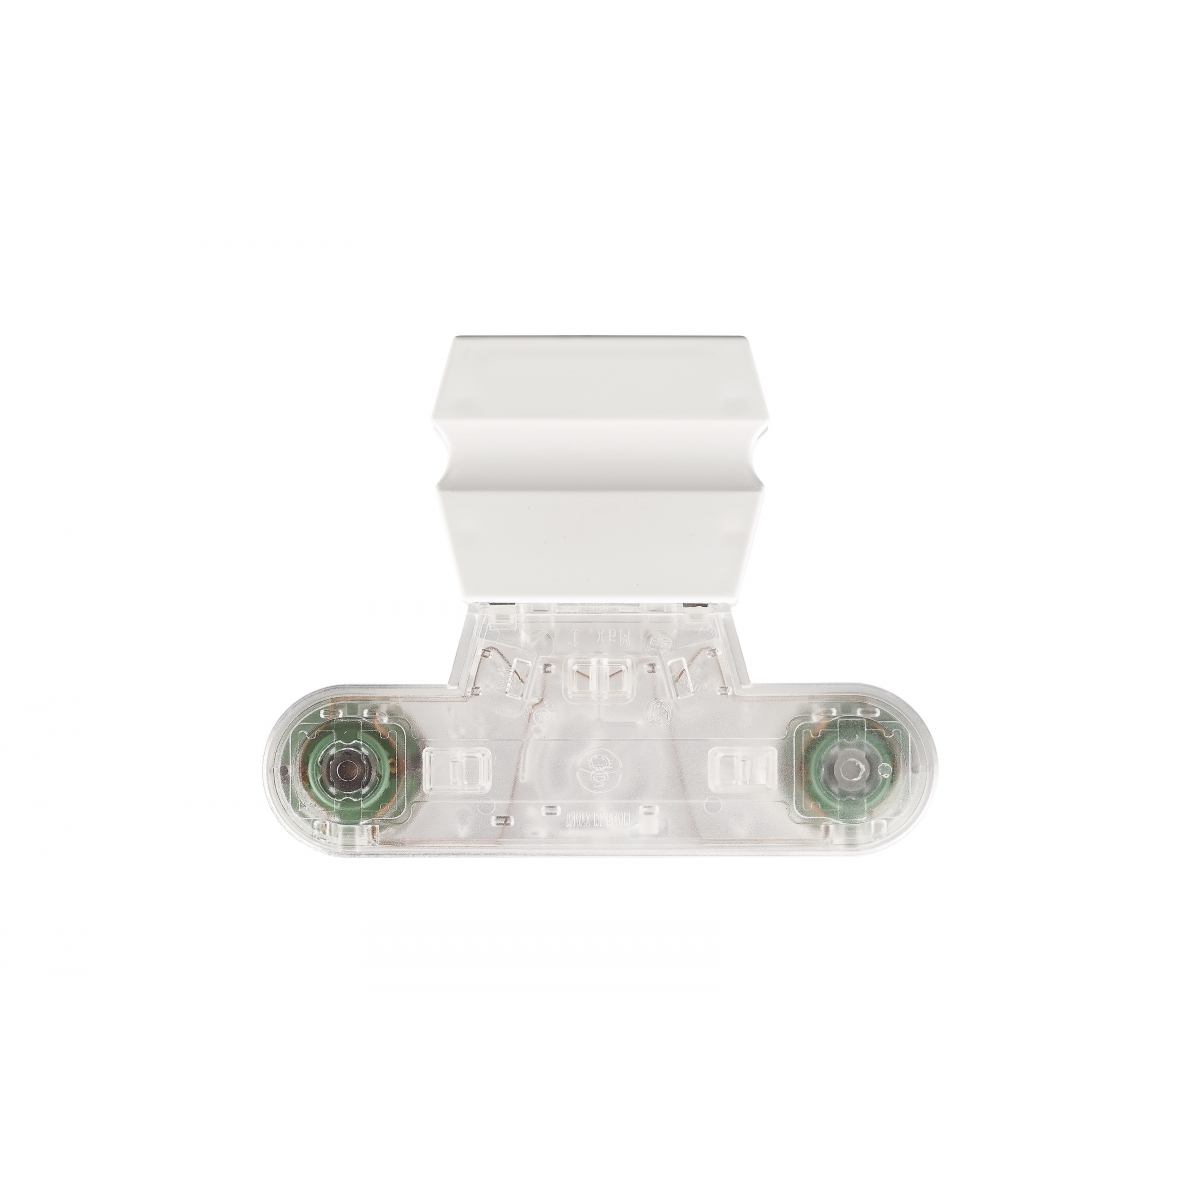 neon 2x58w interesting plafoniera stagna ip xw reattore. Black Bedroom Furniture Sets. Home Design Ideas